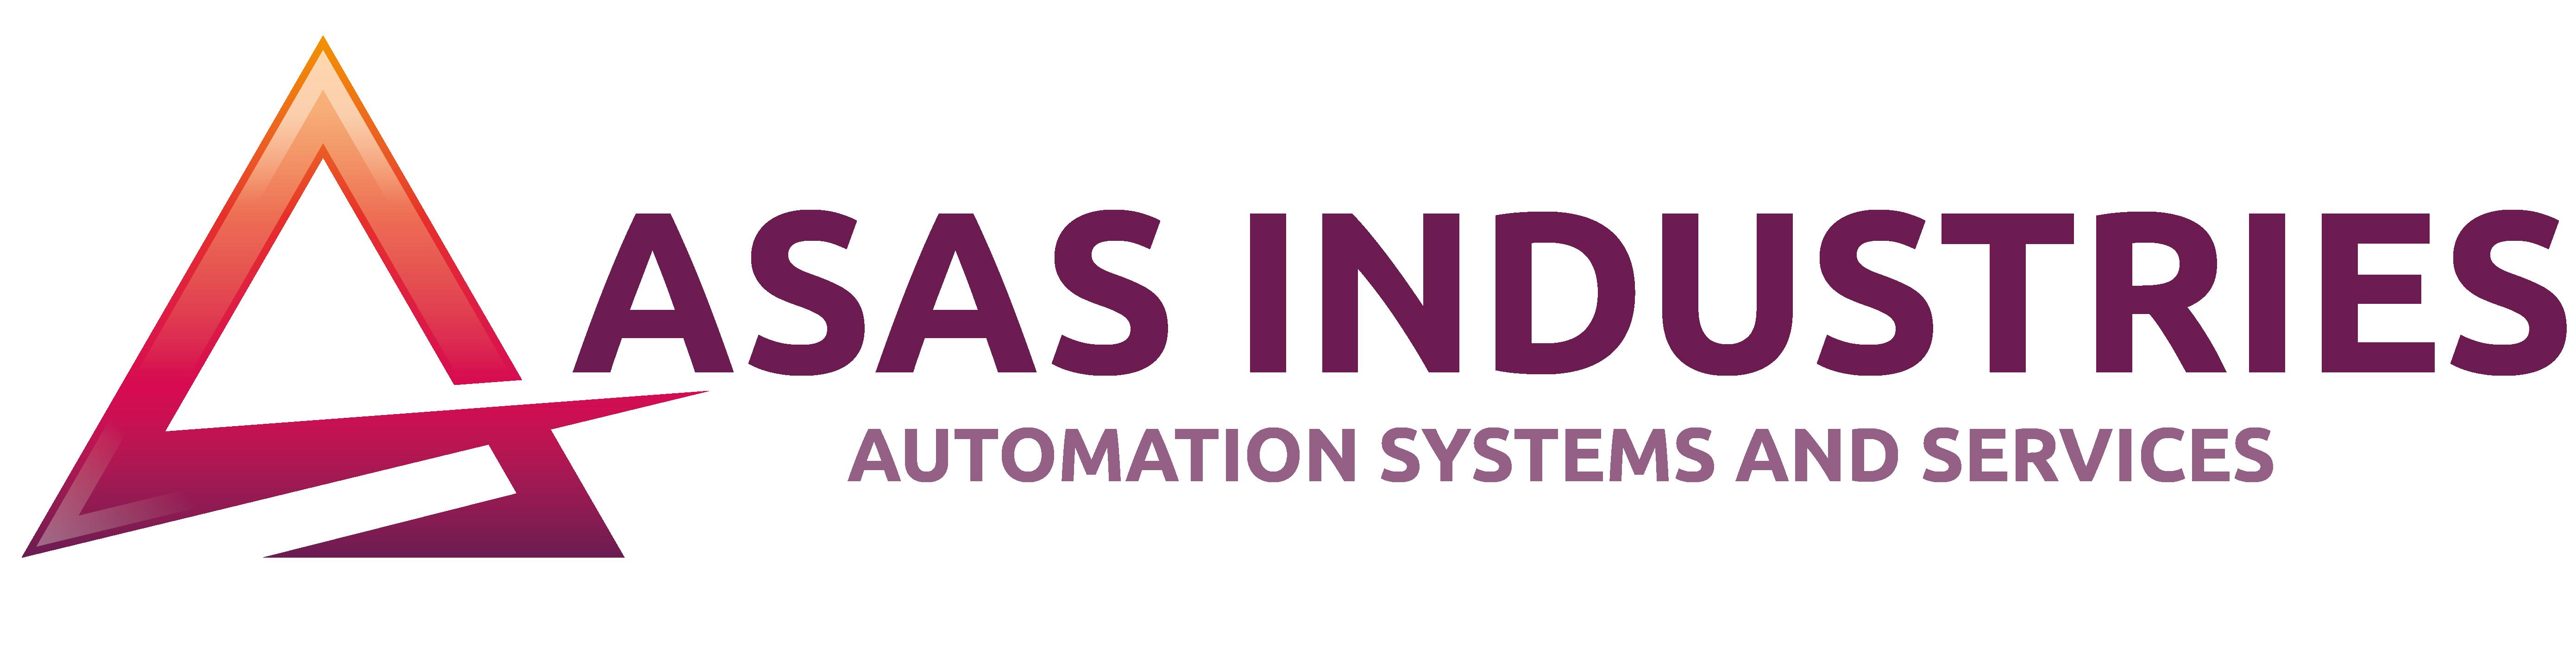 Asas industries